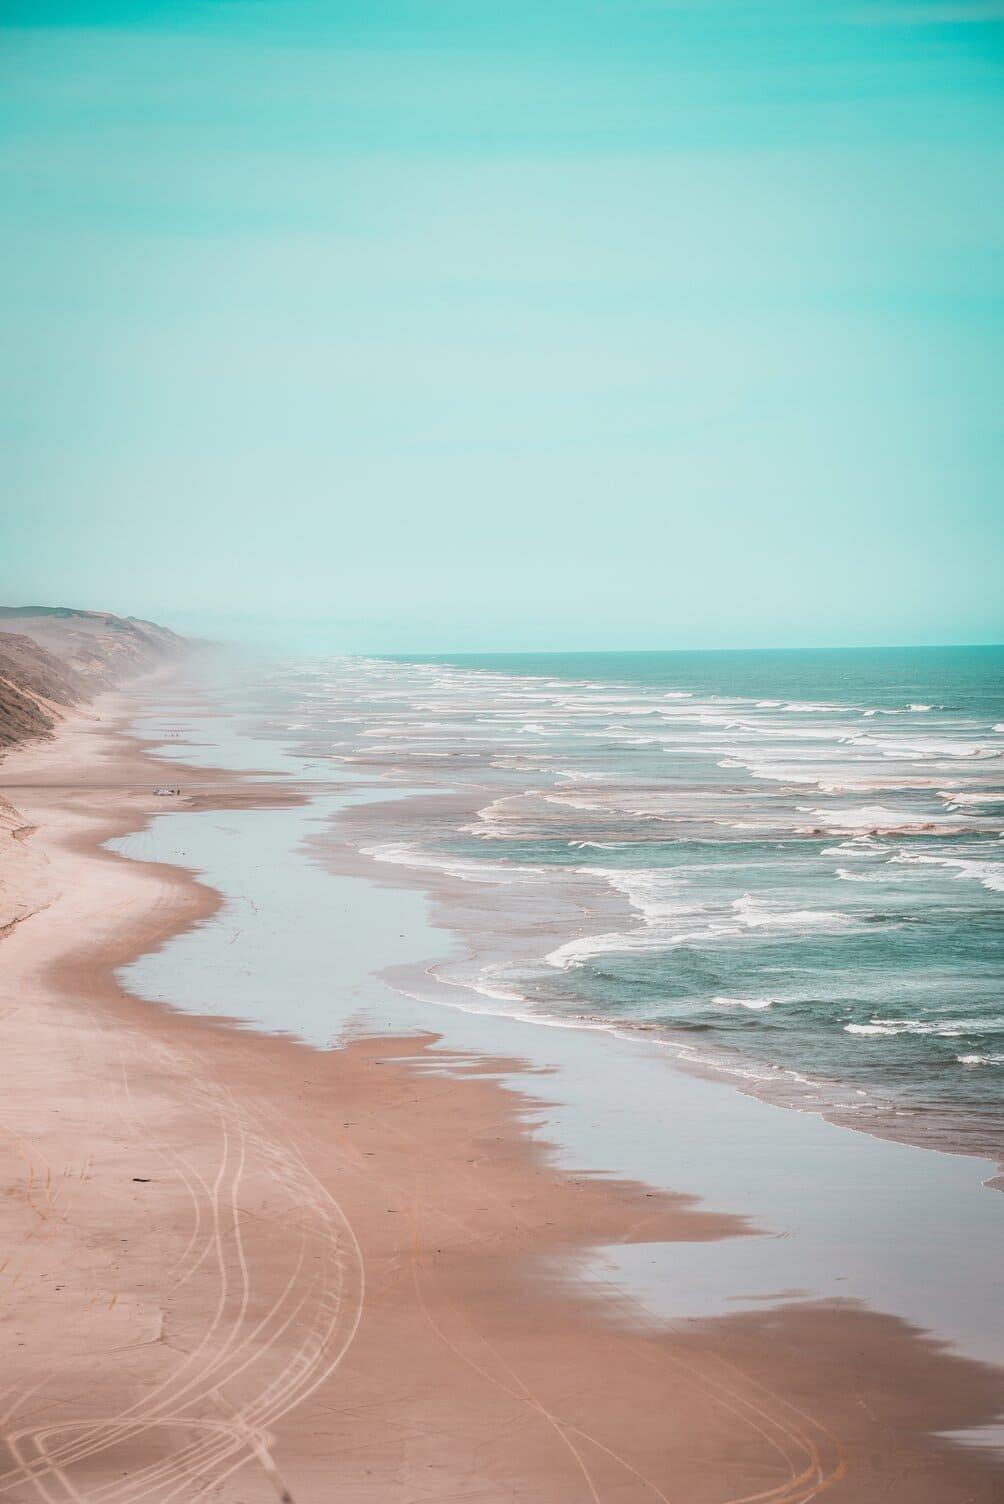 Leisure_beach_costal_line